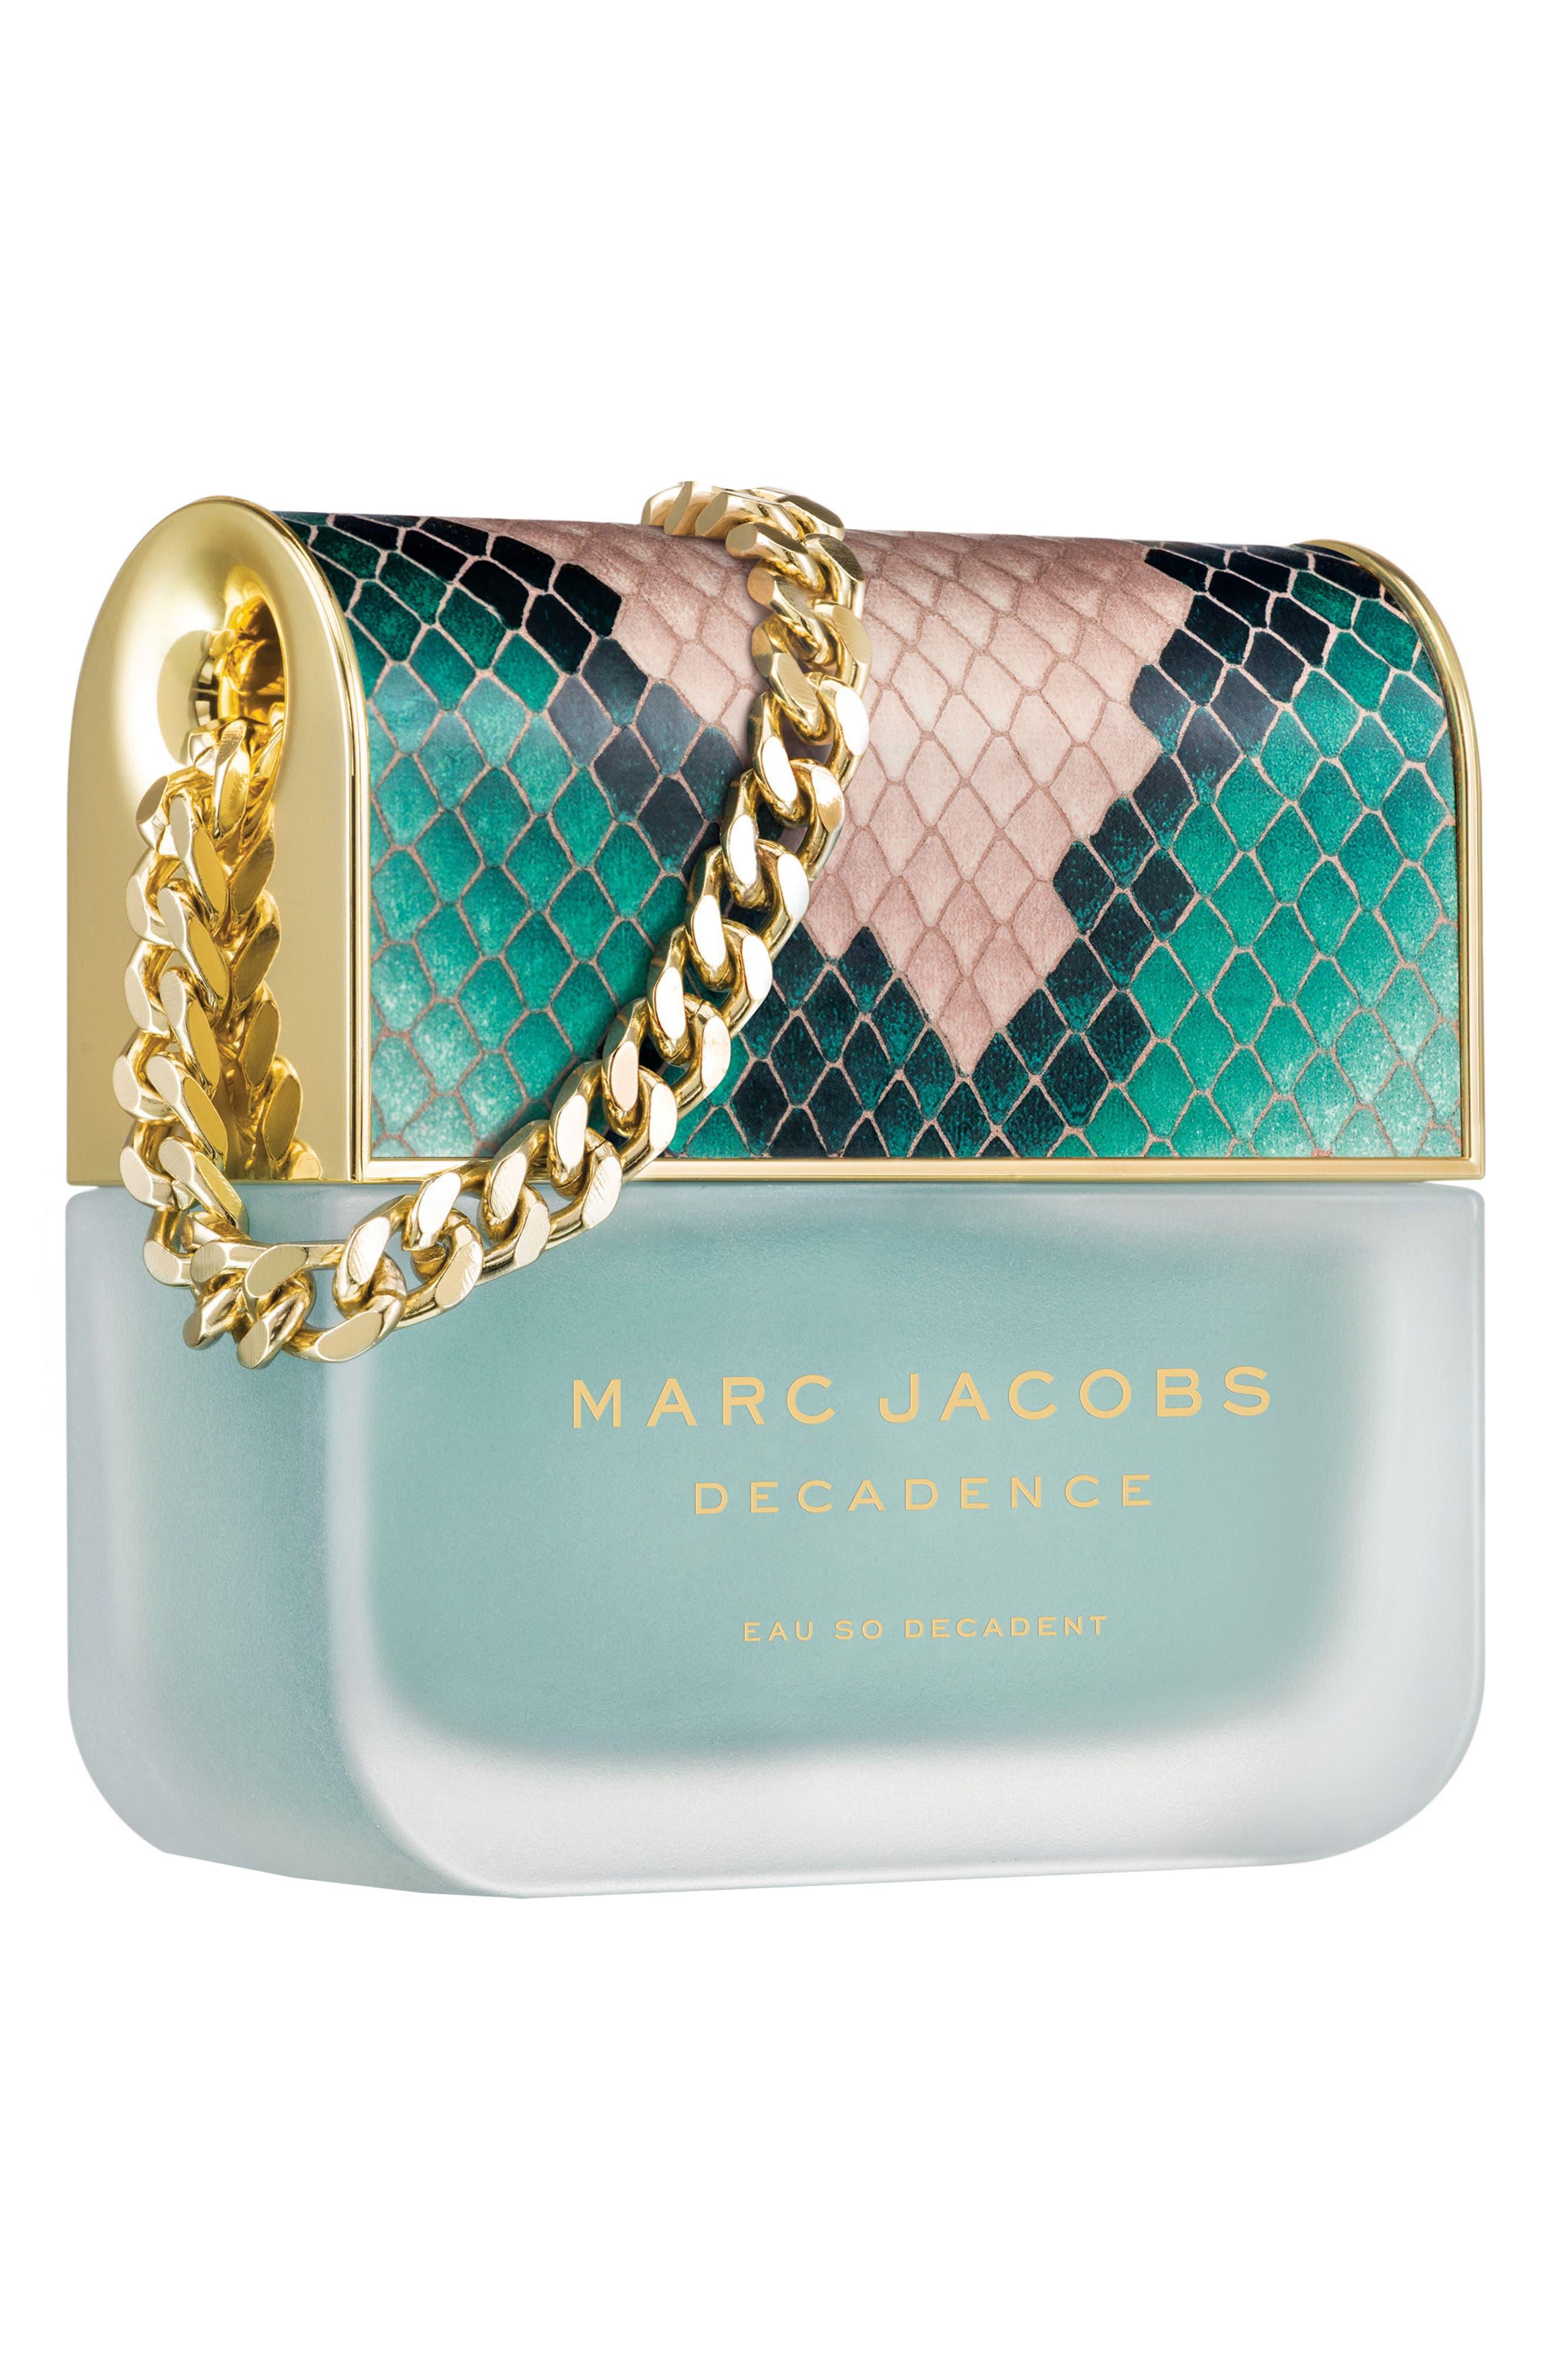 Image of Marc Jacobs Decadence Eau so Decadent  - 1.7 fl oz